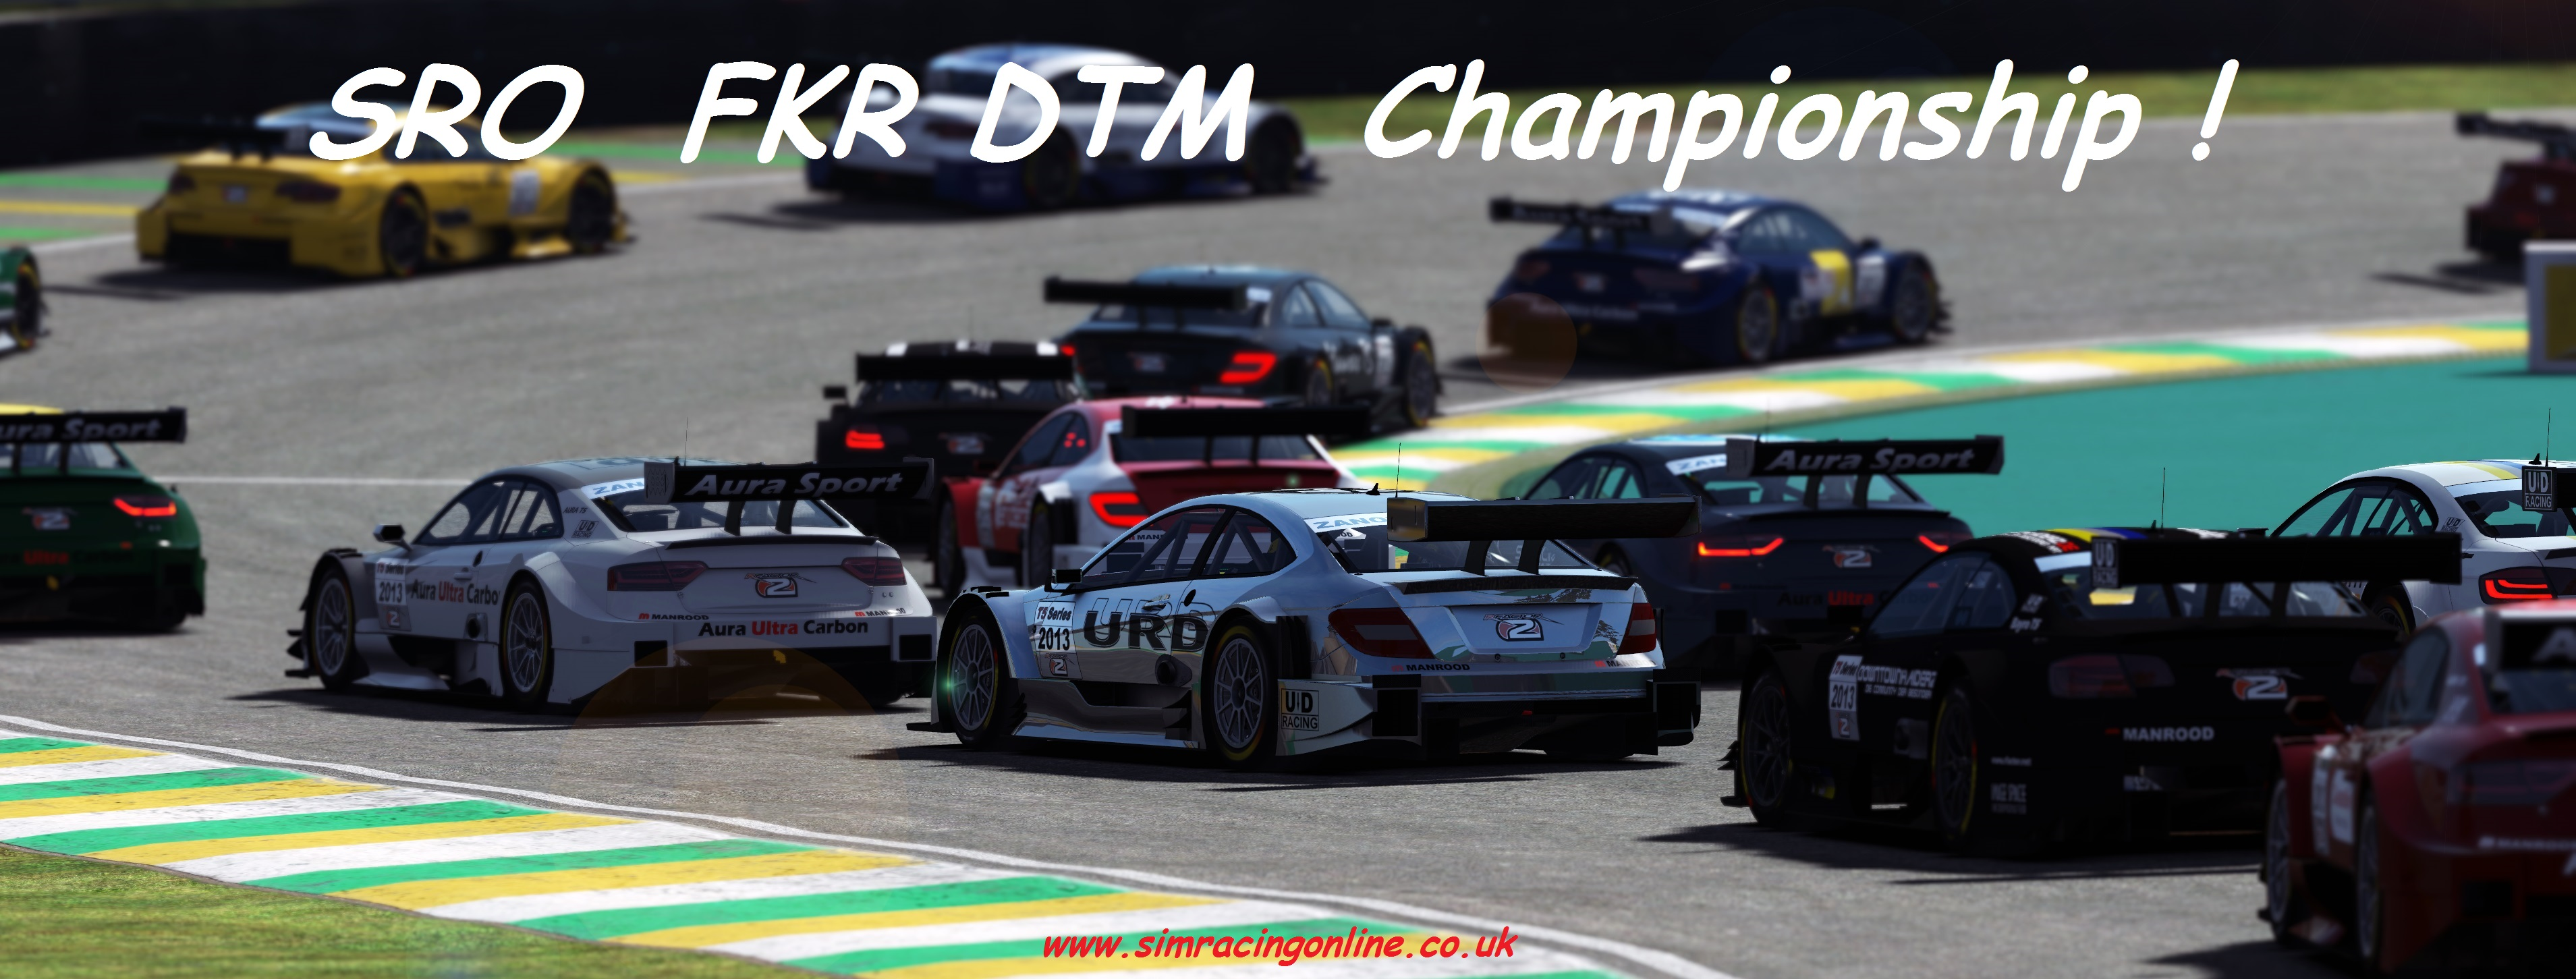 FKR DTM Pic 2.jpg